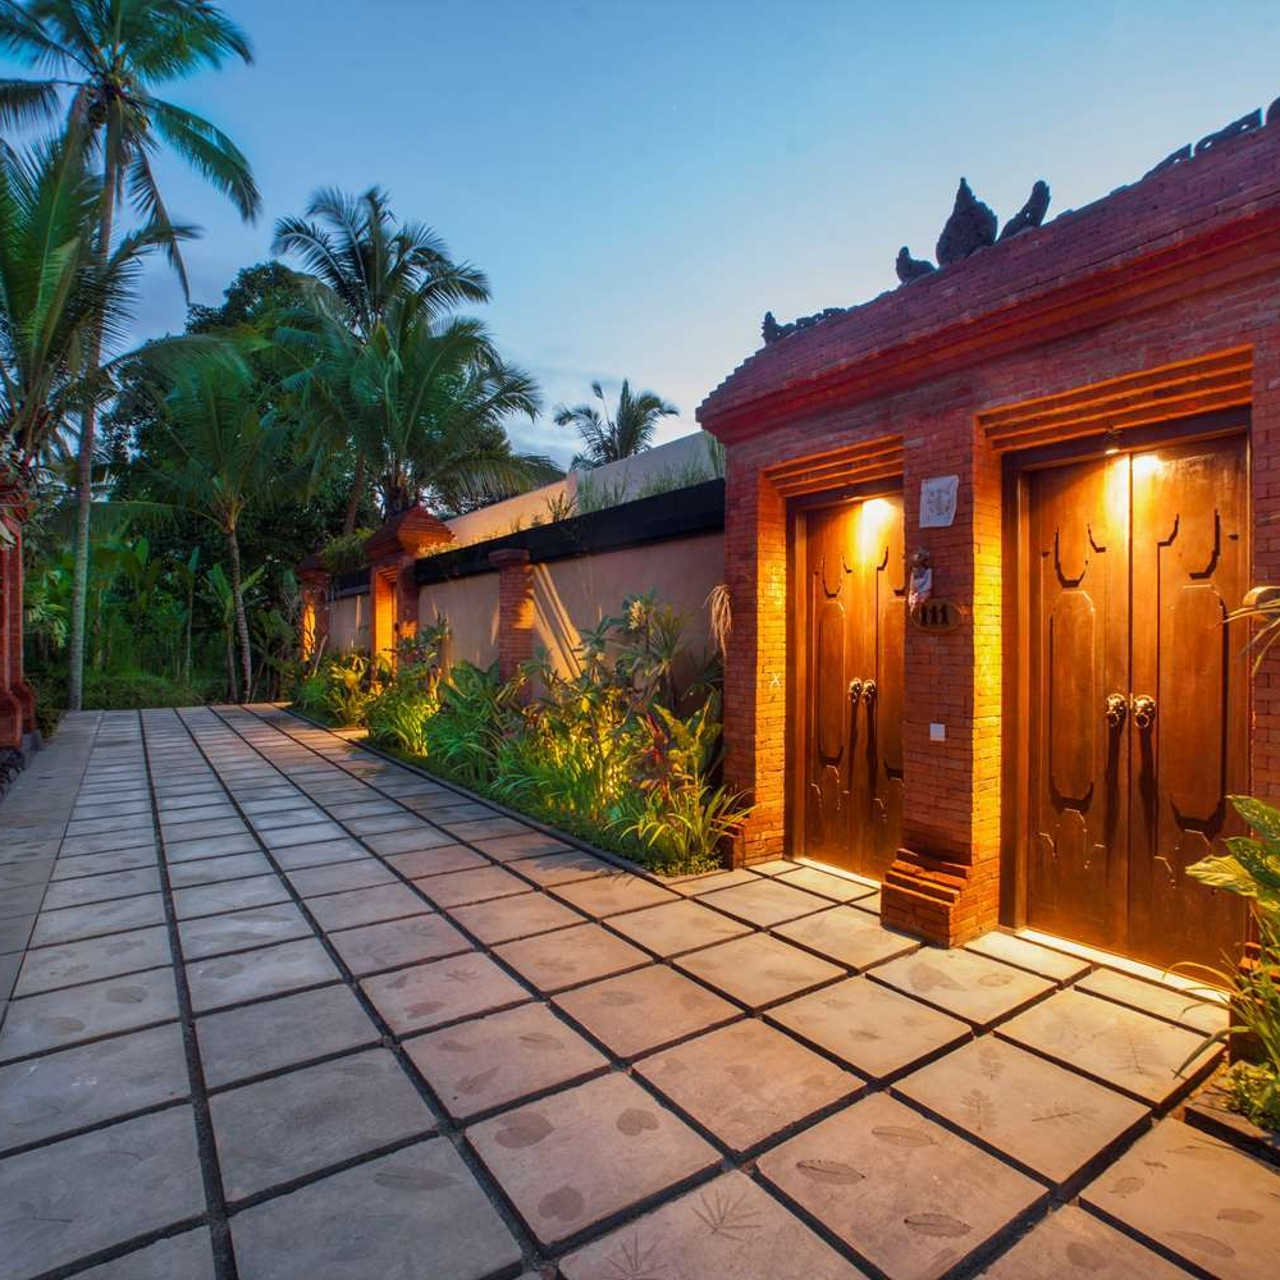 Hotel Nandini Jungle Resort Spa Bali 4 Hrs Star Hotel In Ubud Bali